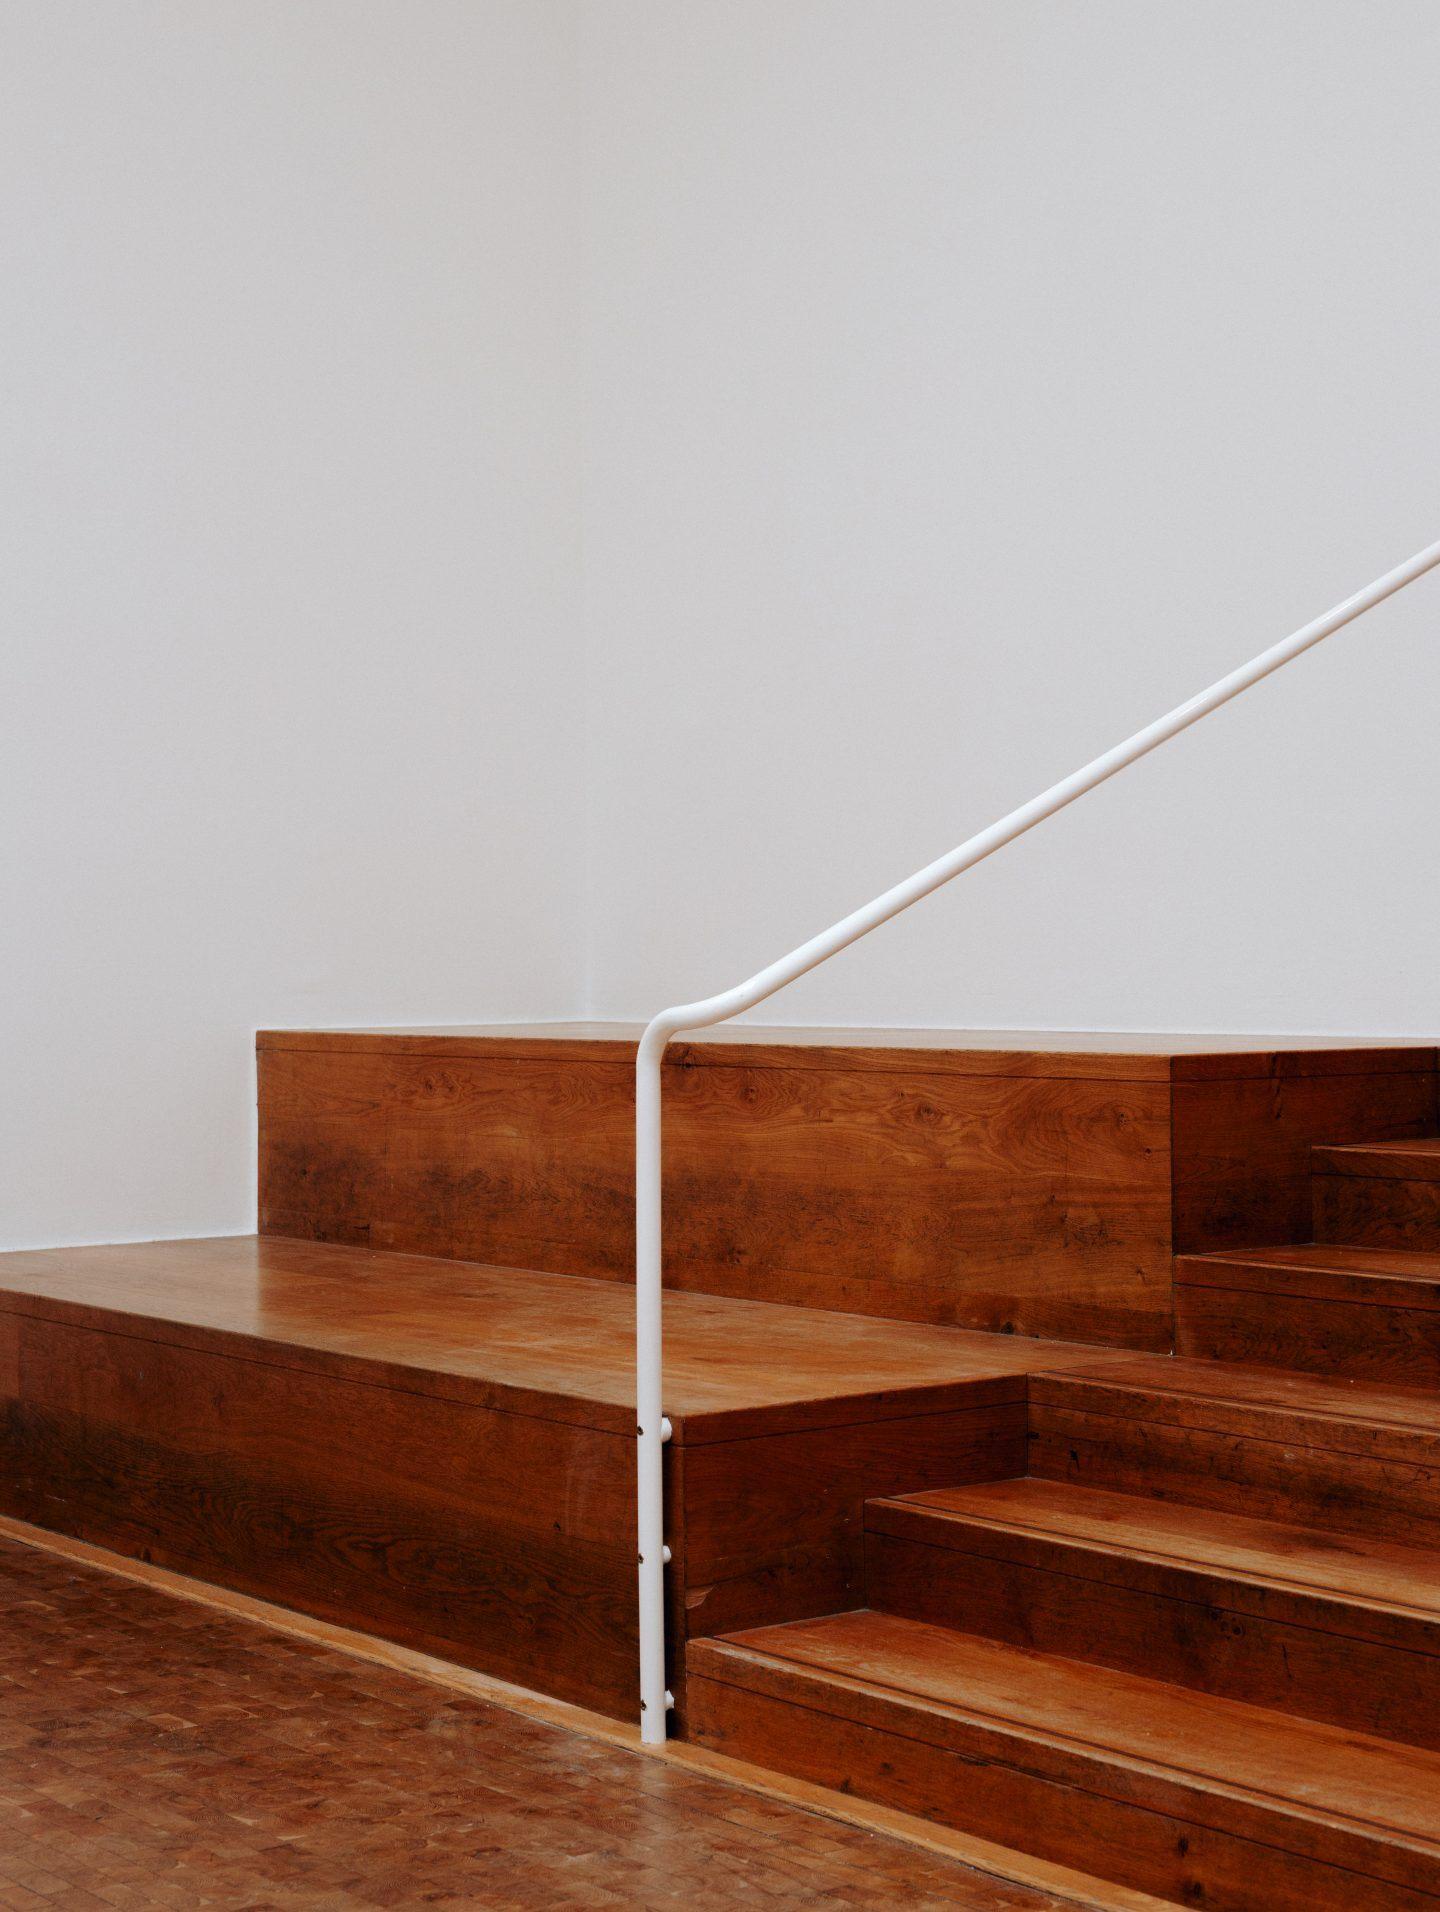 ignant-design-thomas-pirot-wade-guyton-museum-ludwig-20